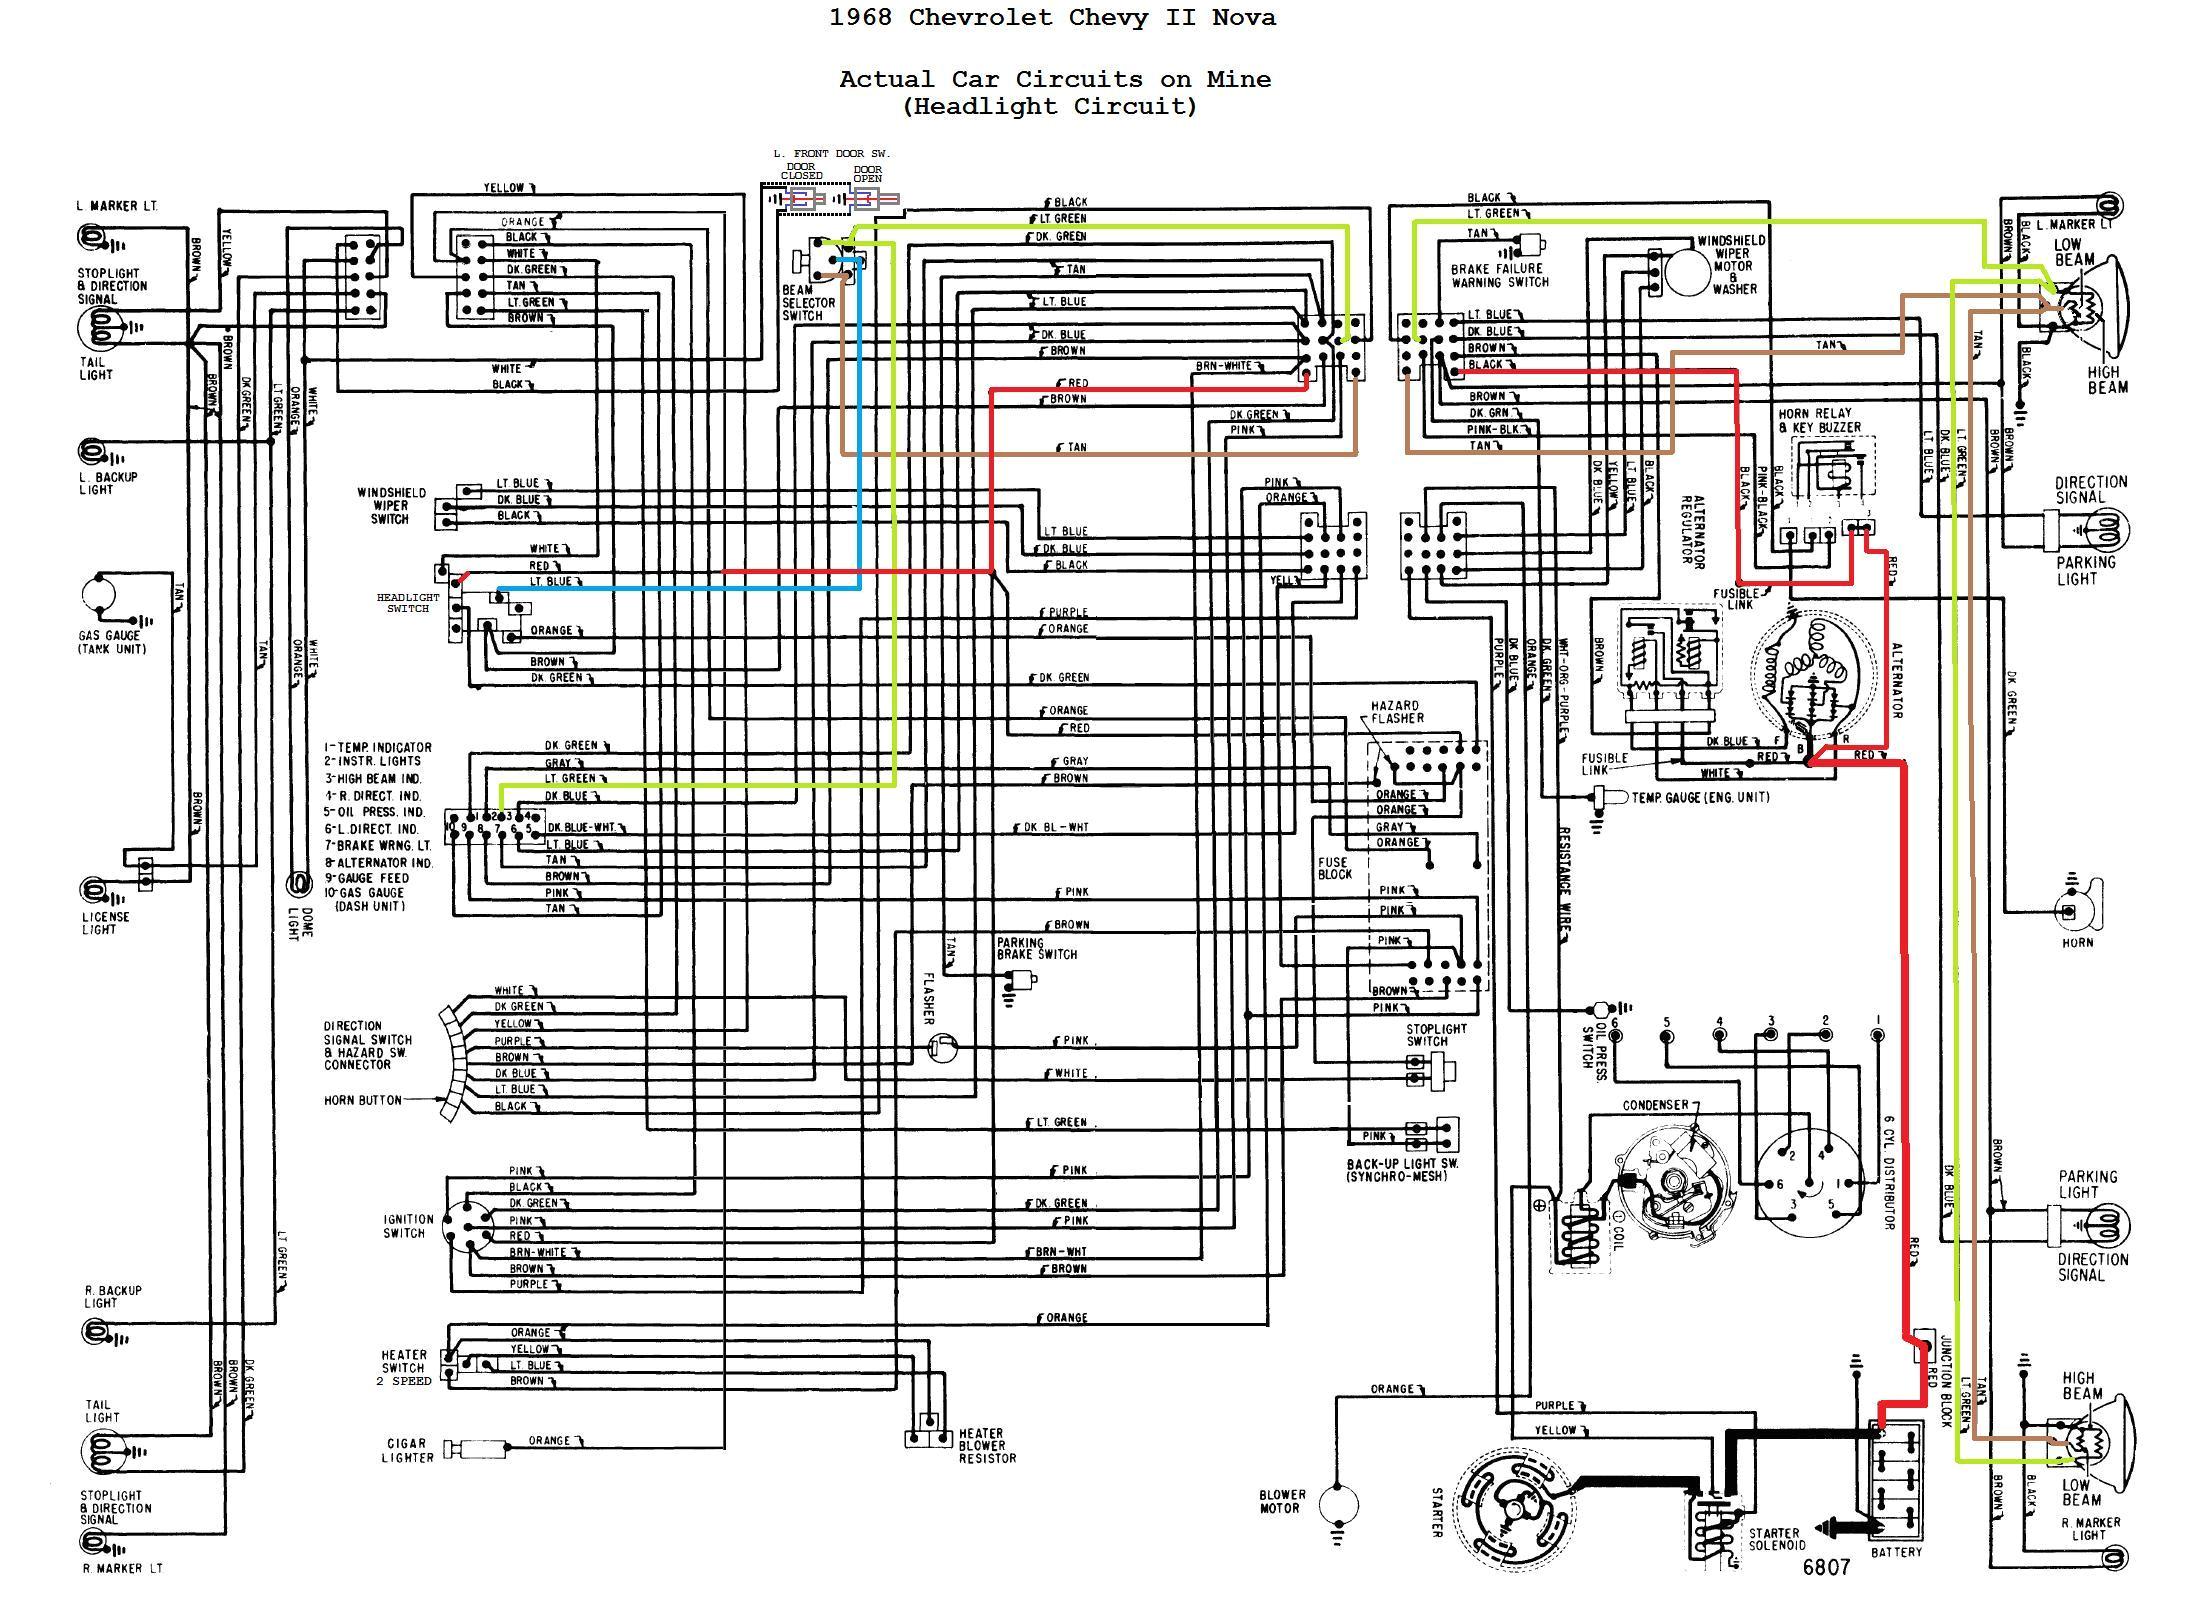 67 mustang tach wiring diagram wiring diagram centre 68 mustang ignition switch wiring diagram